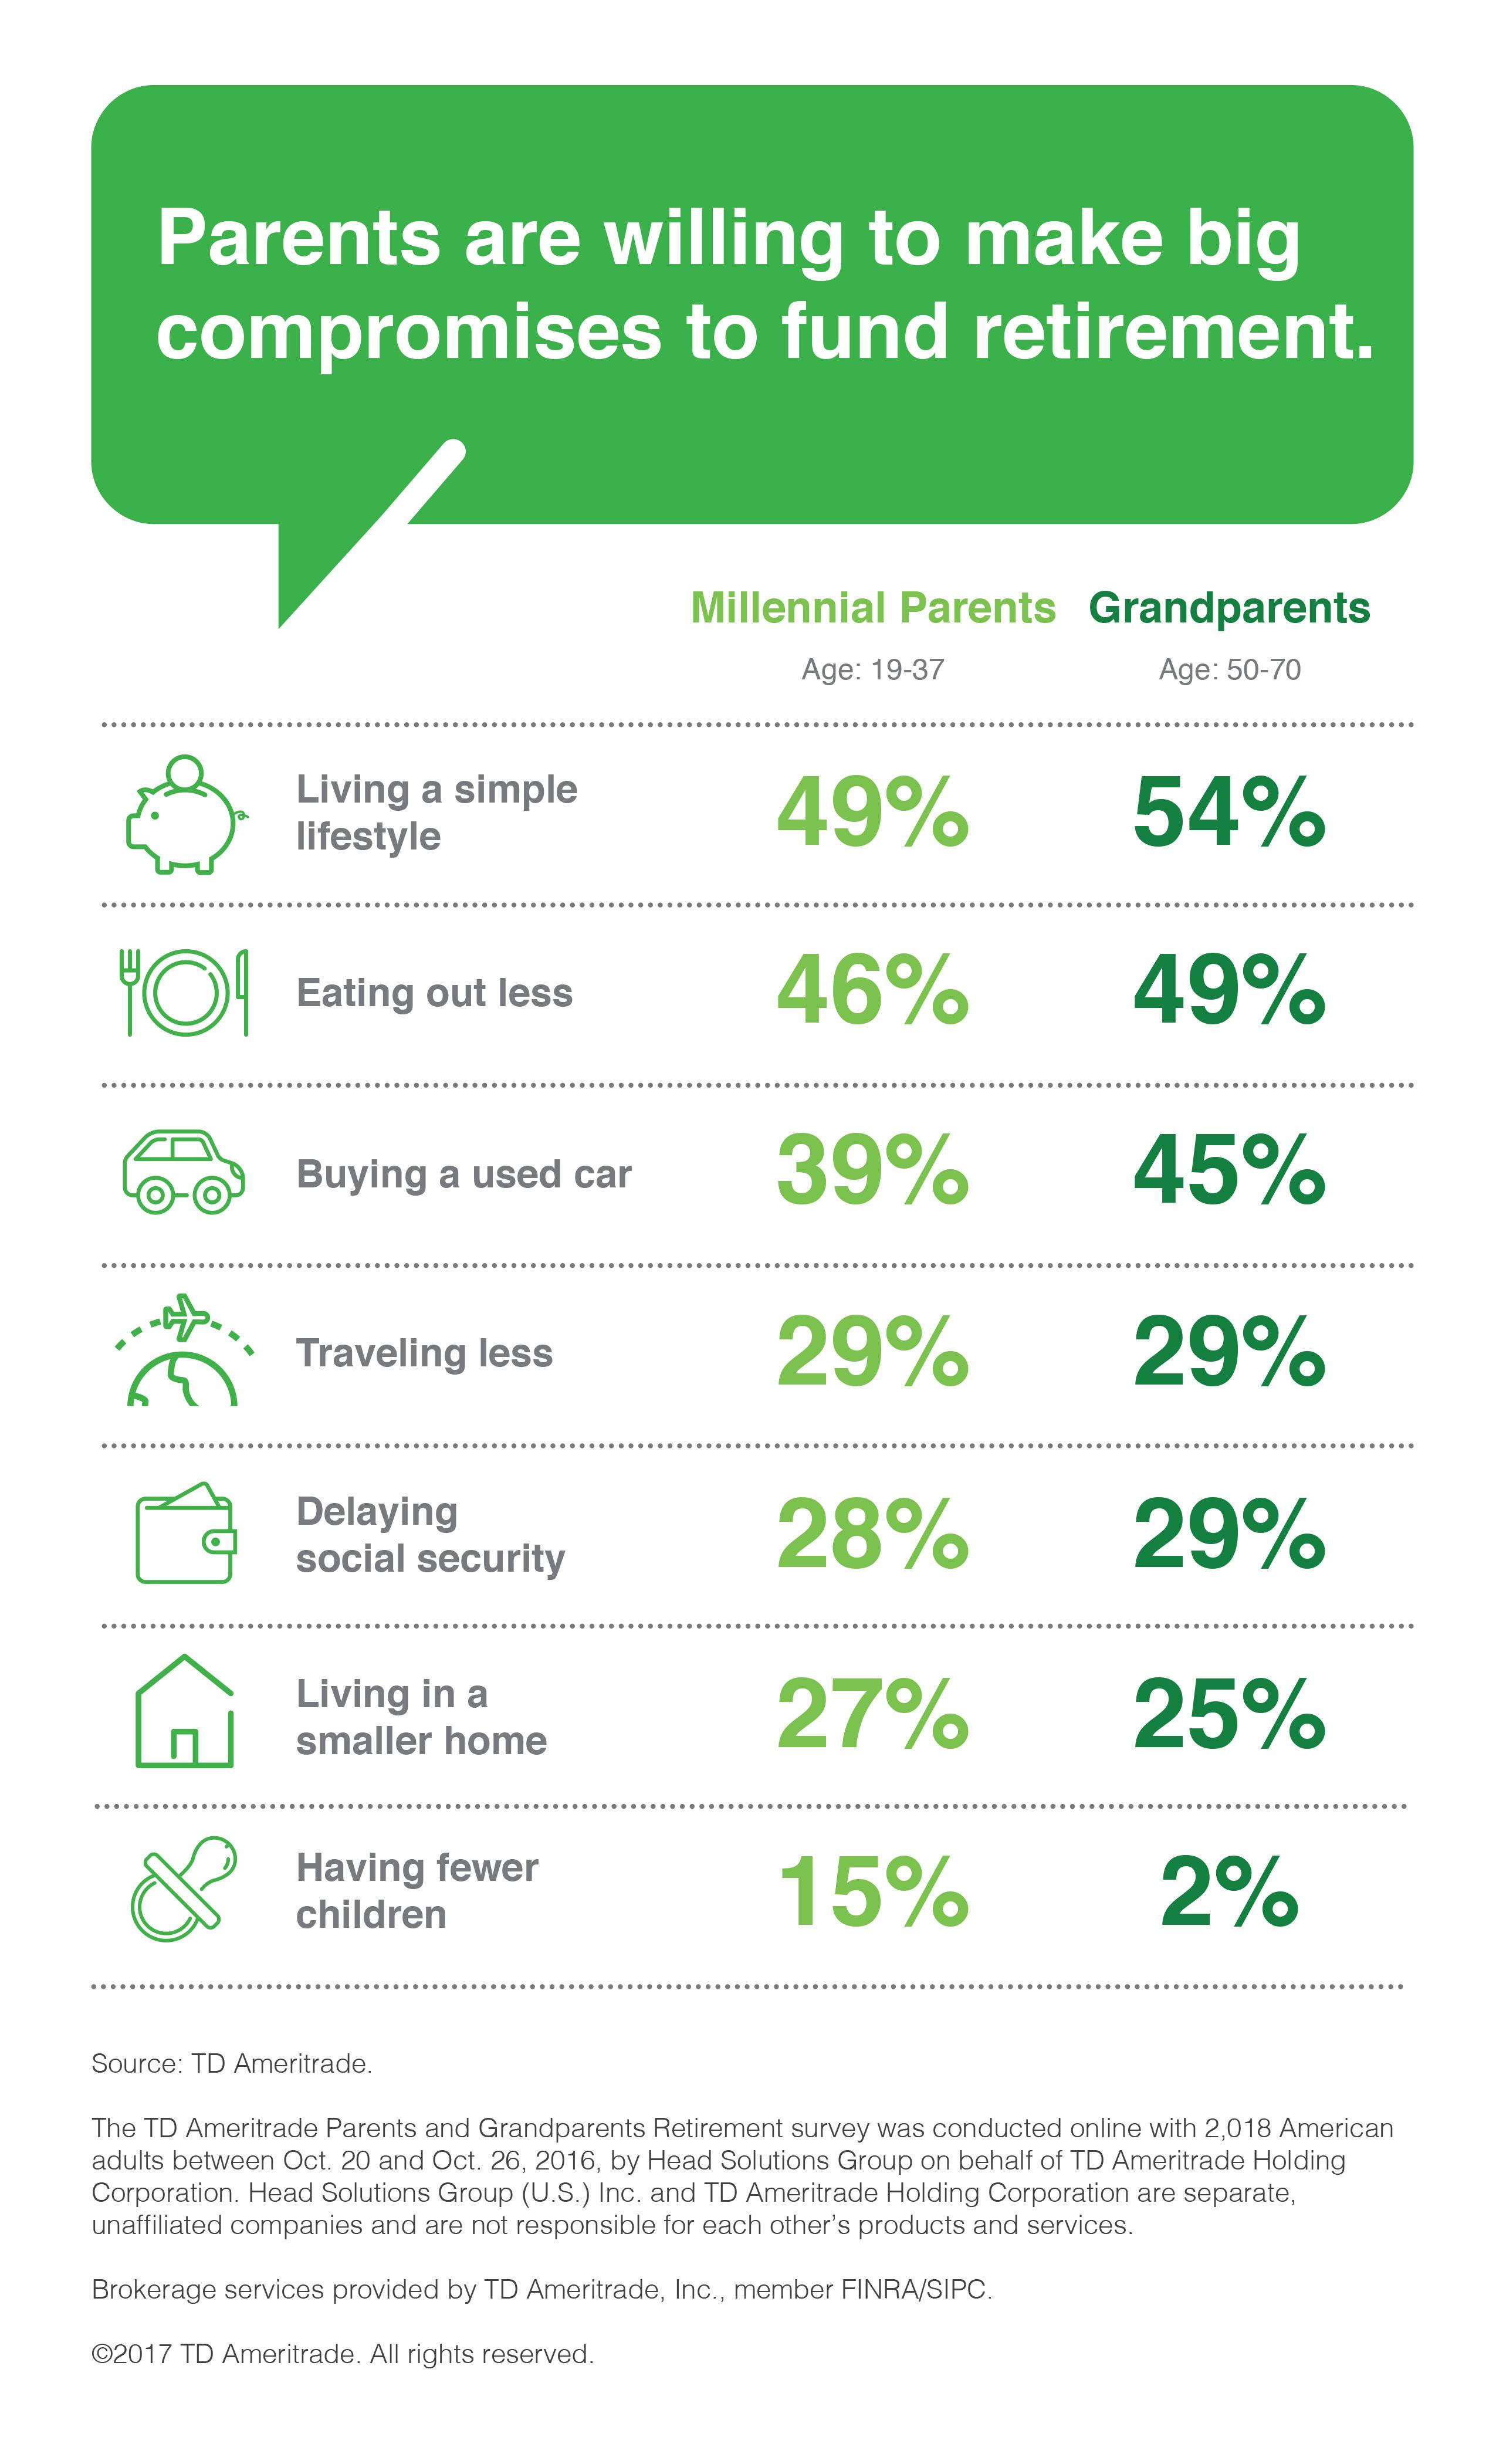 Parents and Grandparents Retirement Survey infographic (Graphic: TD Ameritrade).